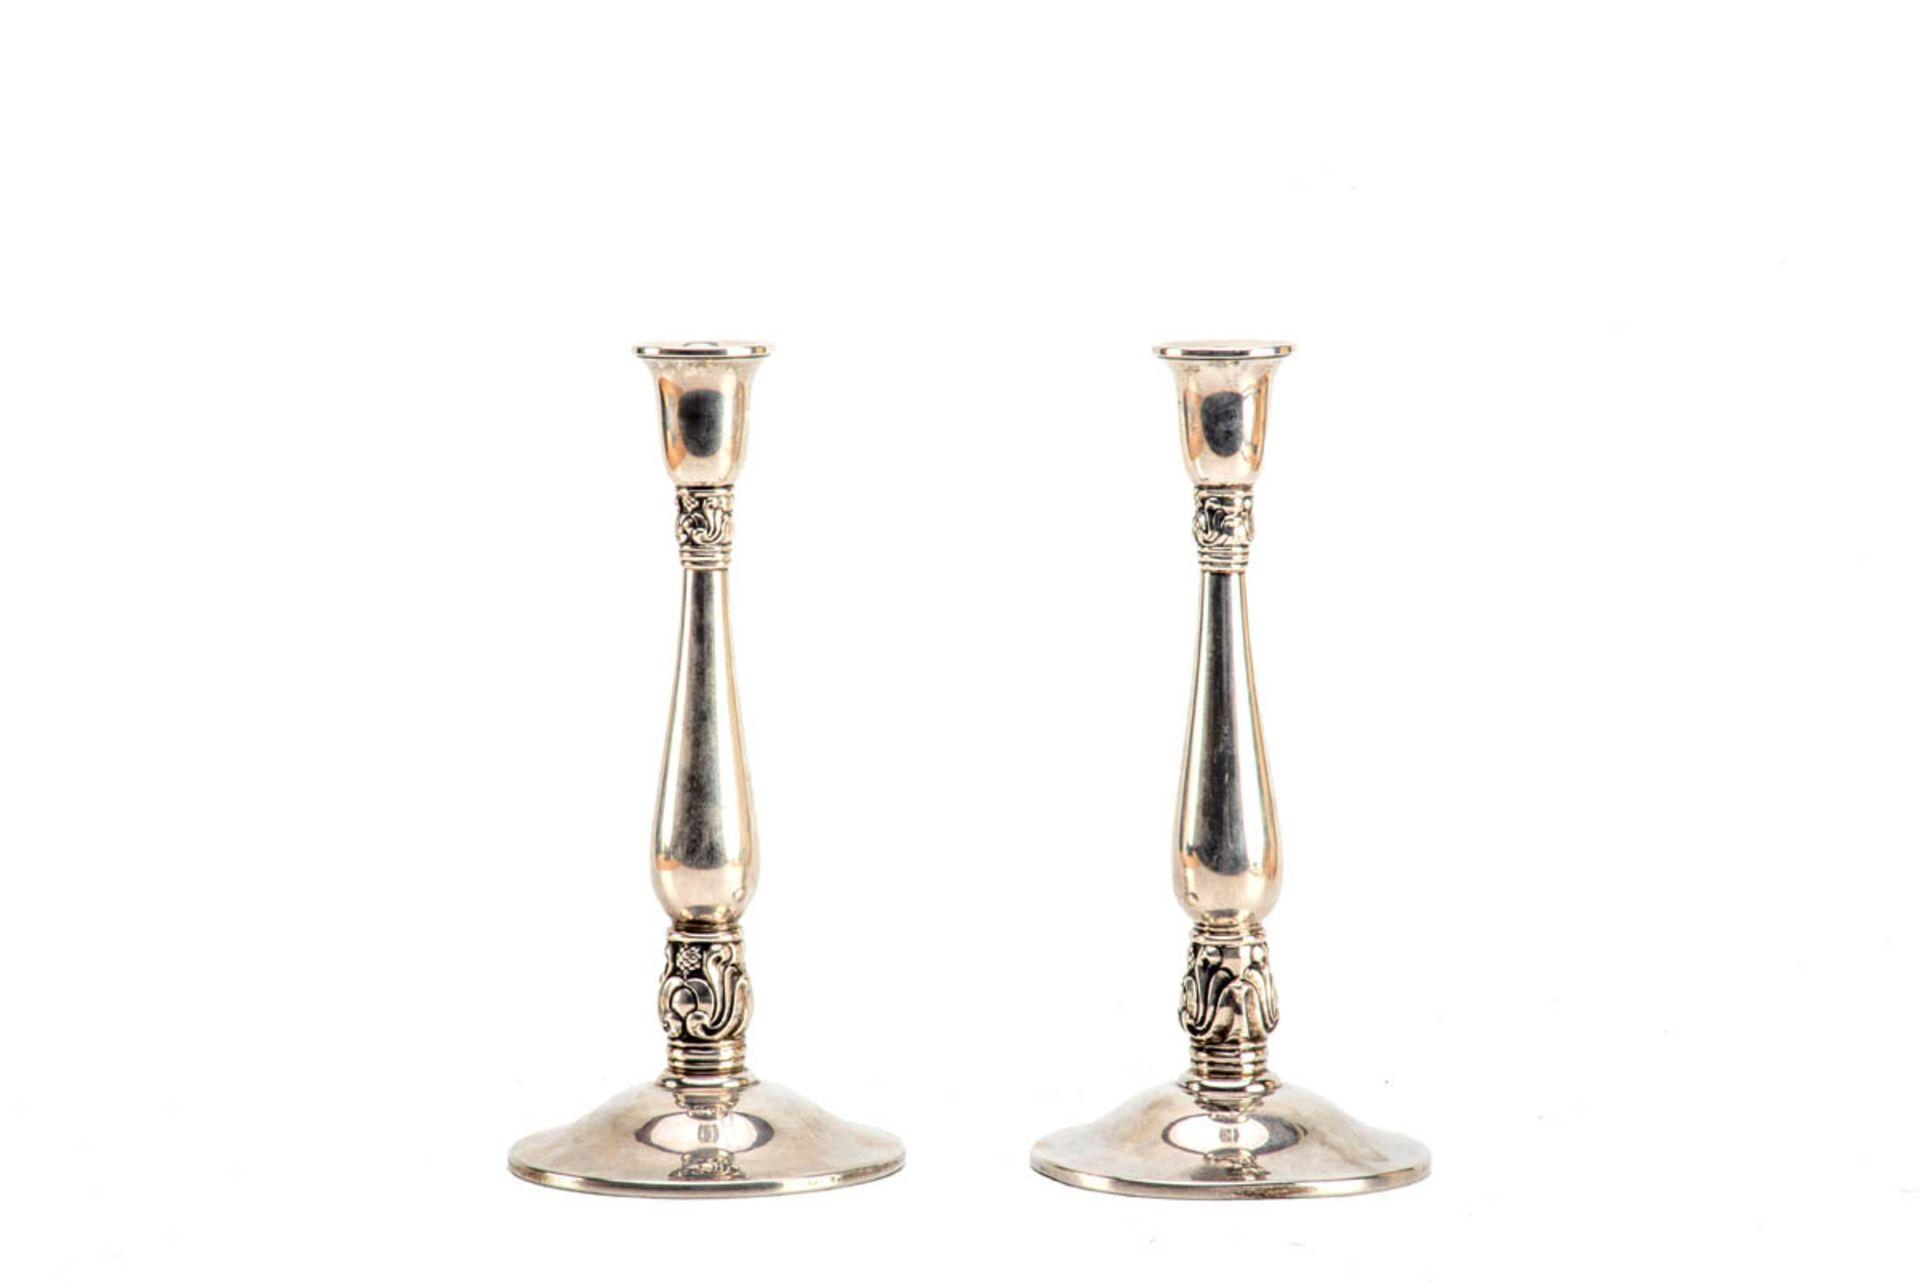 Los 27 - Paar Tafelleuchter, Royal Danish, USA um 1920 Sterling-Silber. Runder leicht gewölbter Fuß,